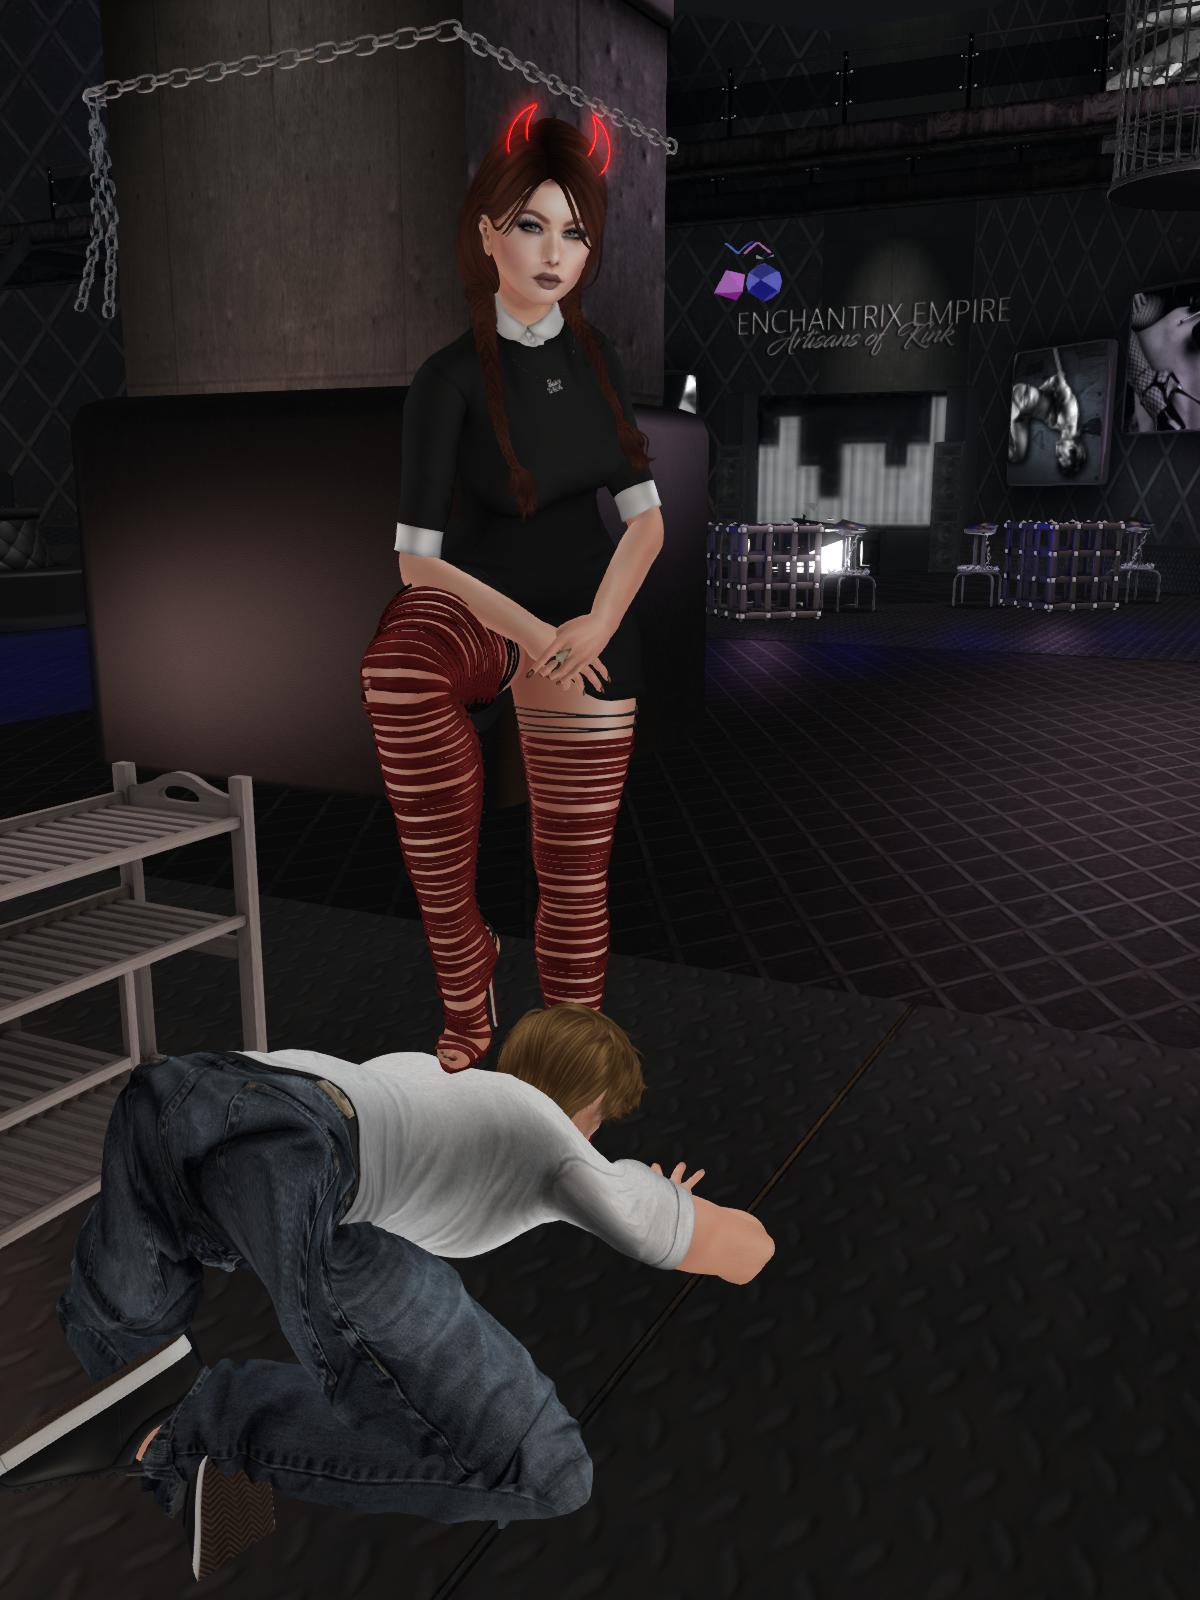 Virtual Whore